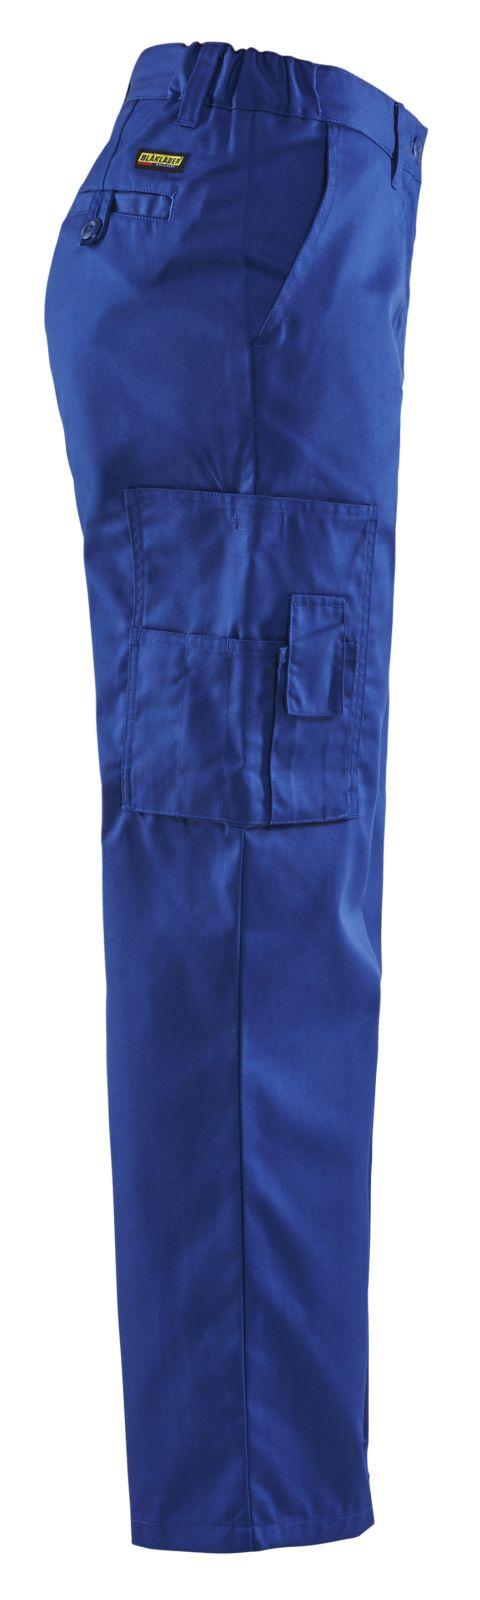 Blaklader Dames werkbroeken 71201800 korenblauw(8500)